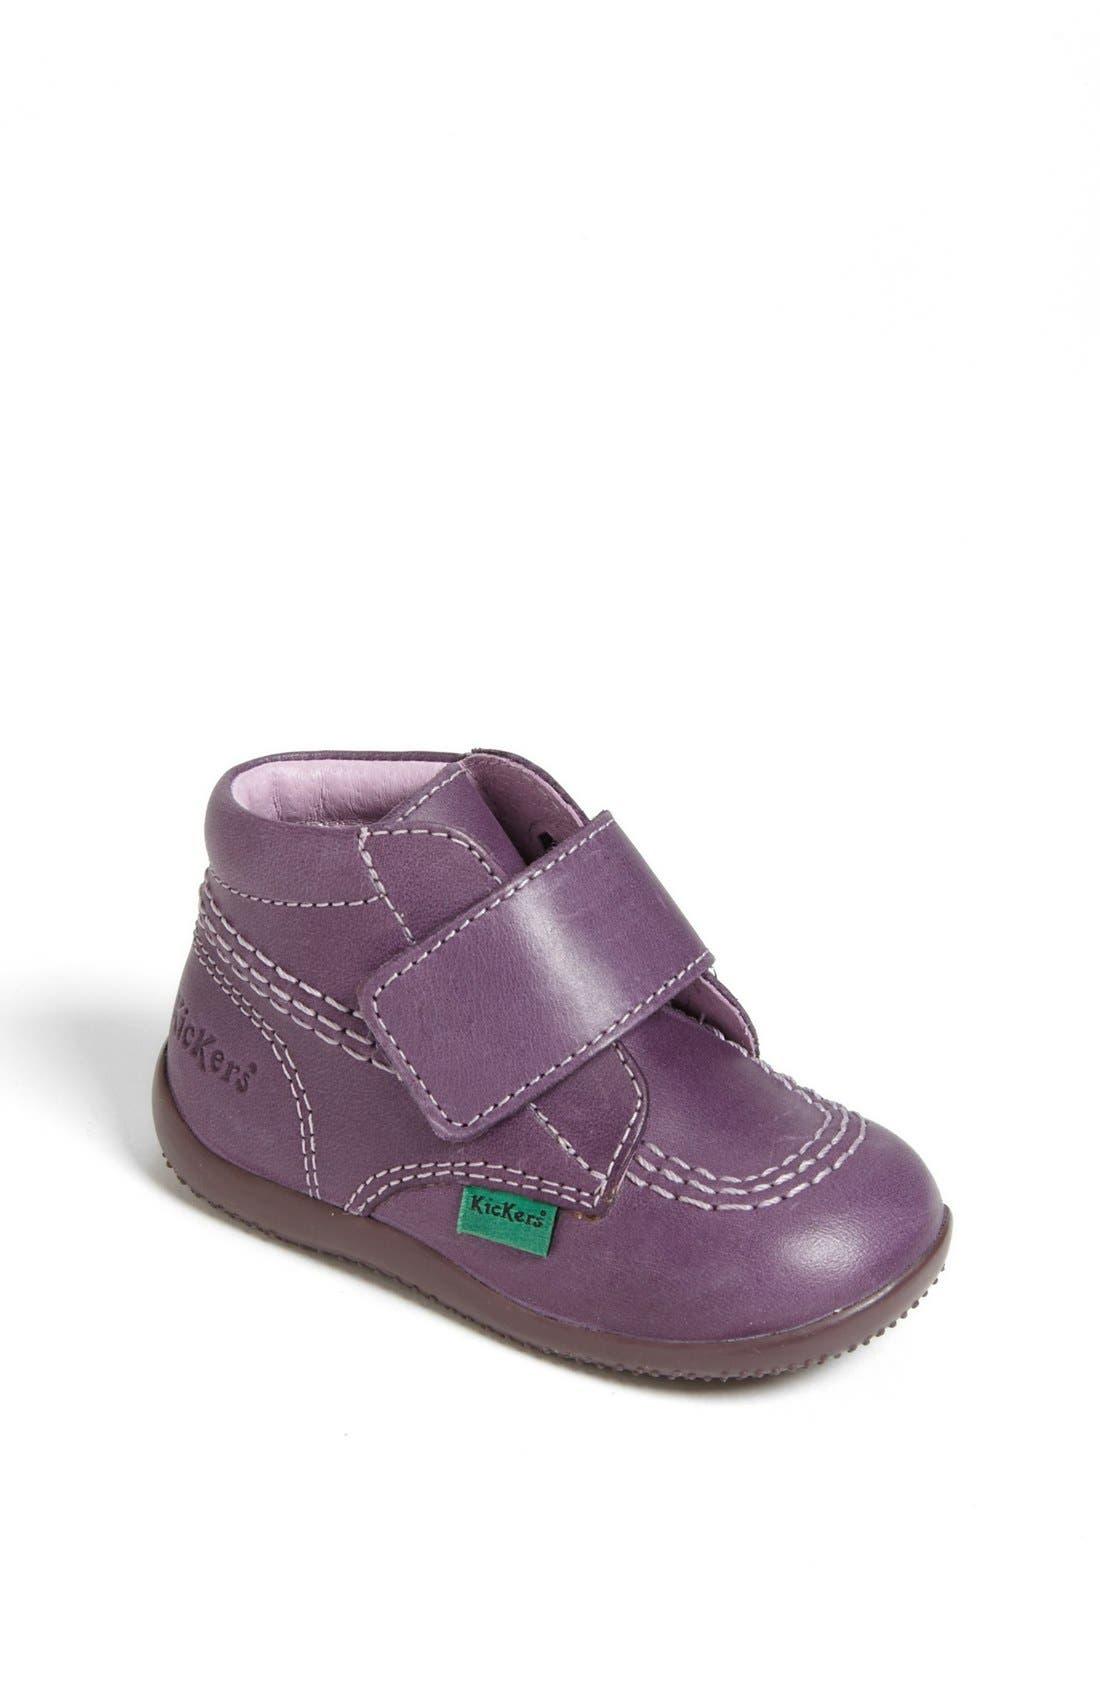 Alternate Image 1 Selected - Kickers 'Bilou 2' Boot (Baby, Walker & Toddler)